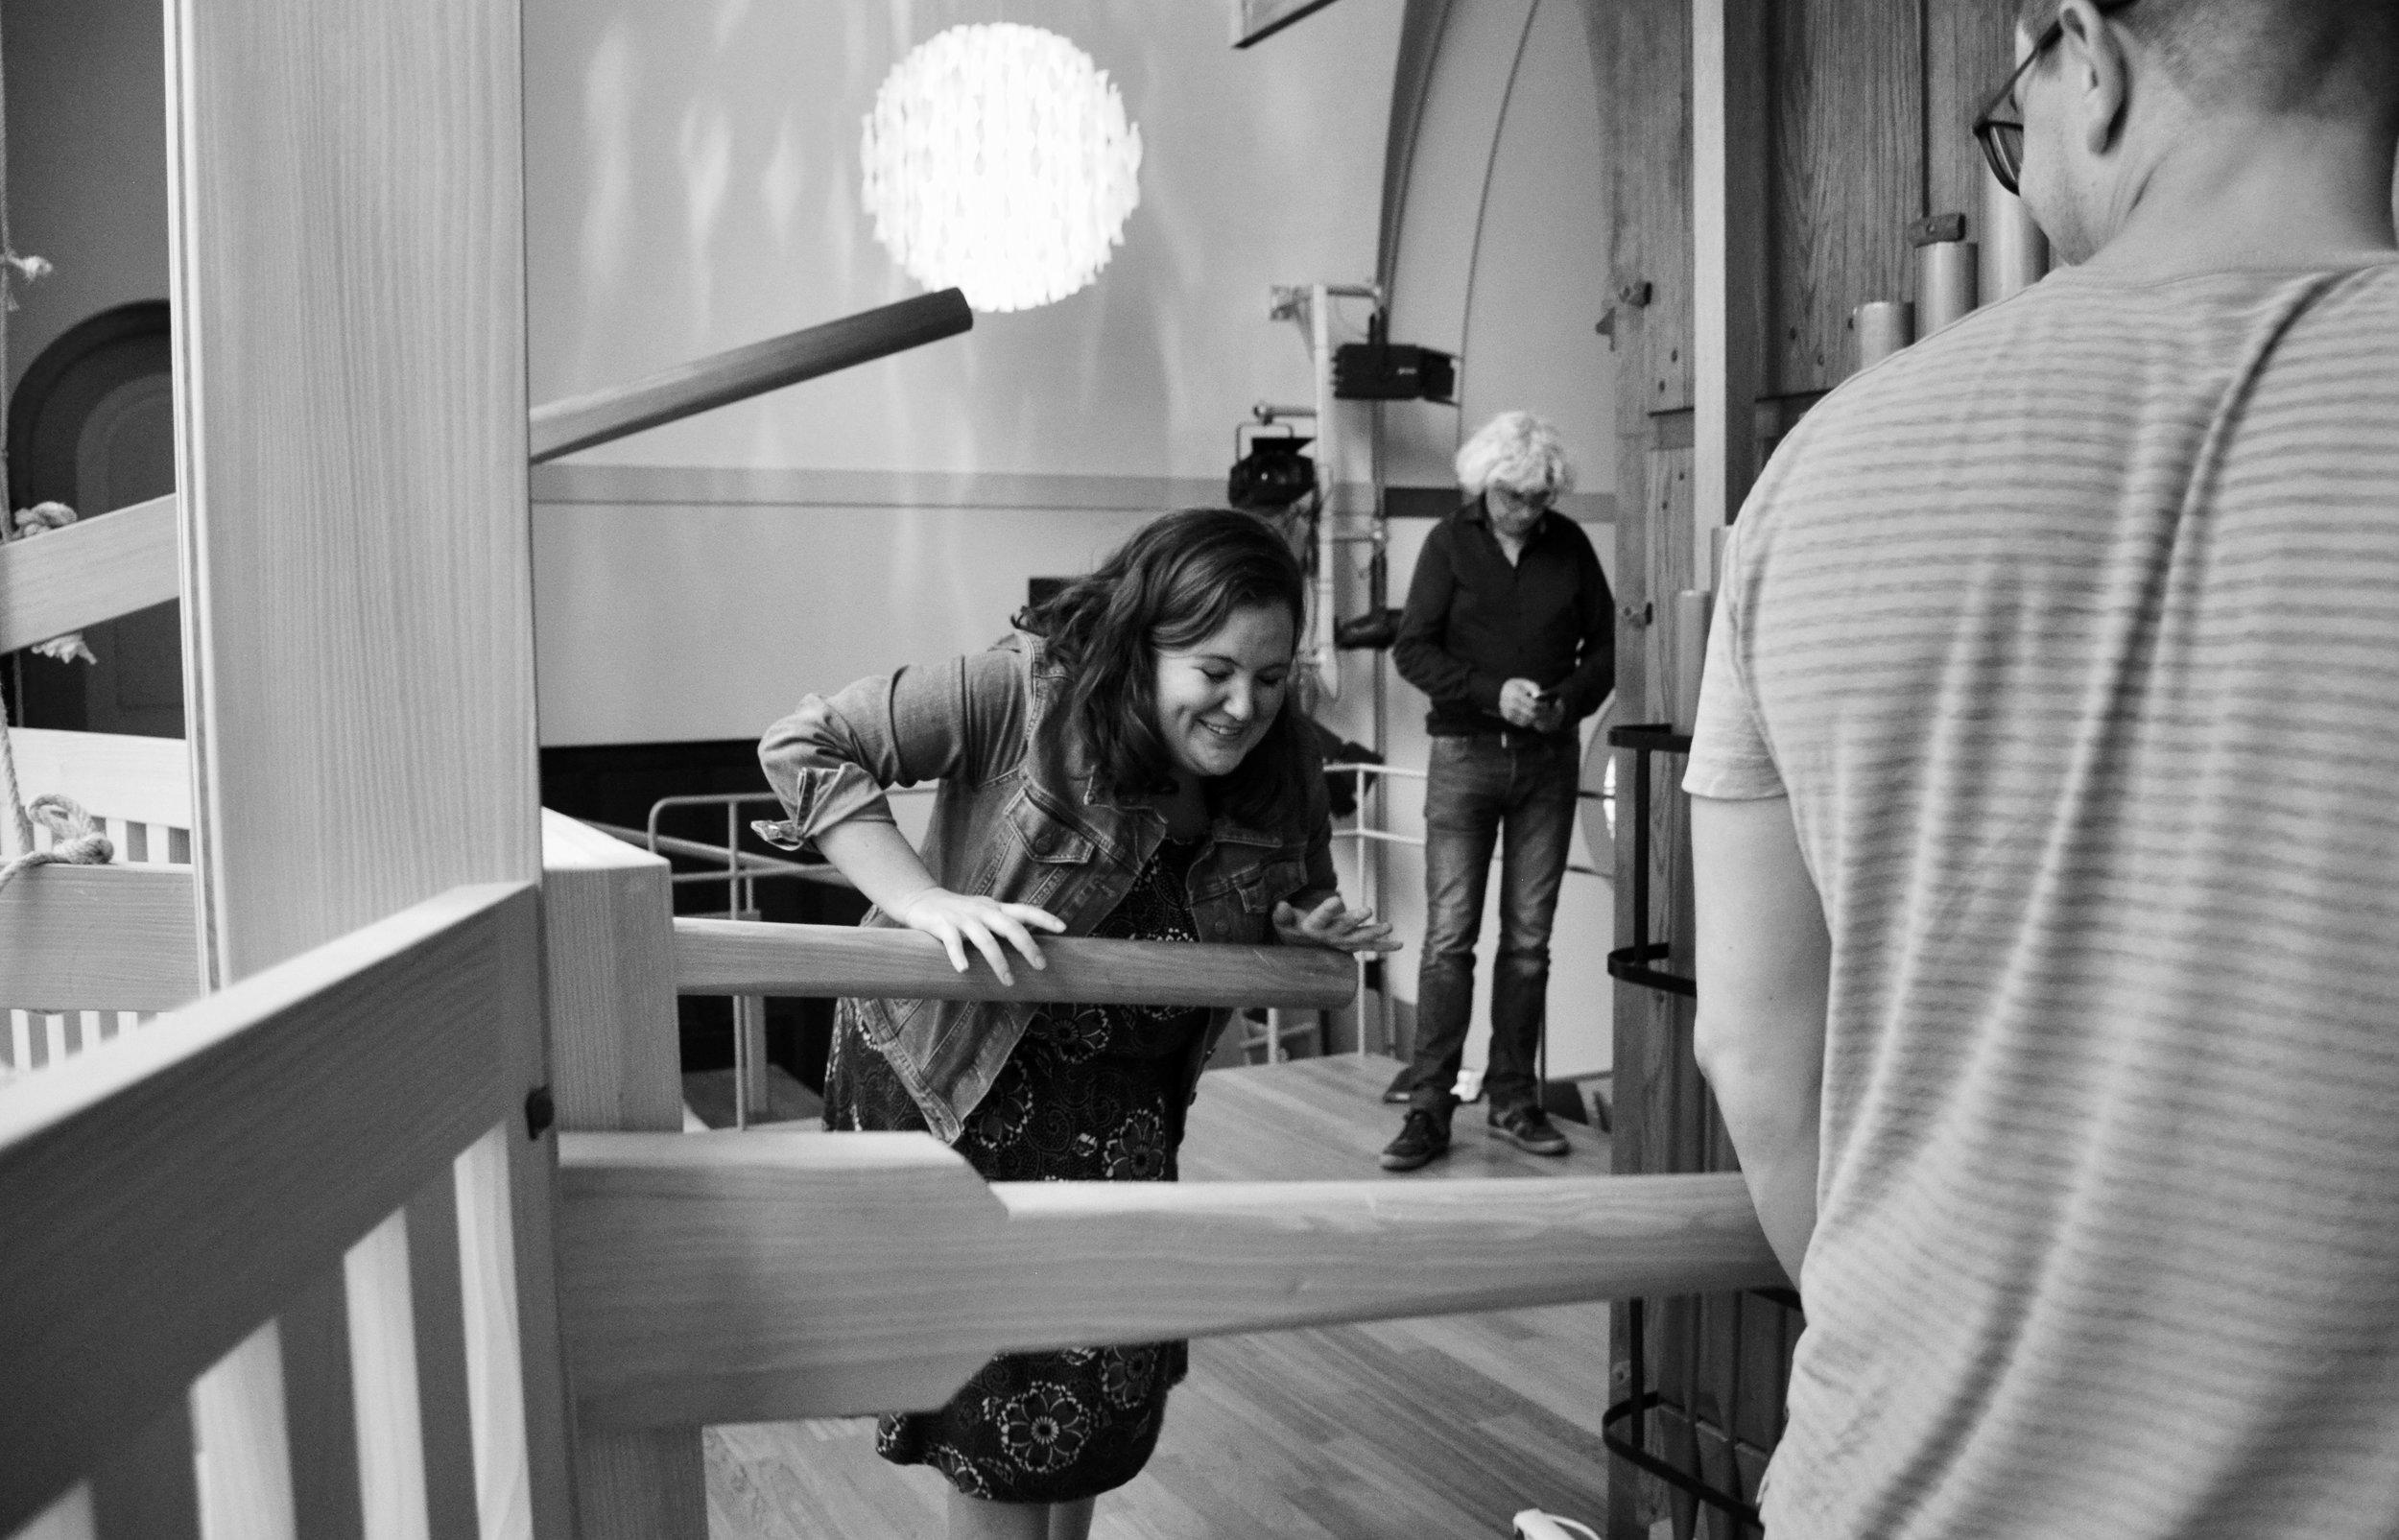 Chelsea Keating pumping the Van Staten organ in Orgelpark, Amsterdam. Boston Organ Studio.